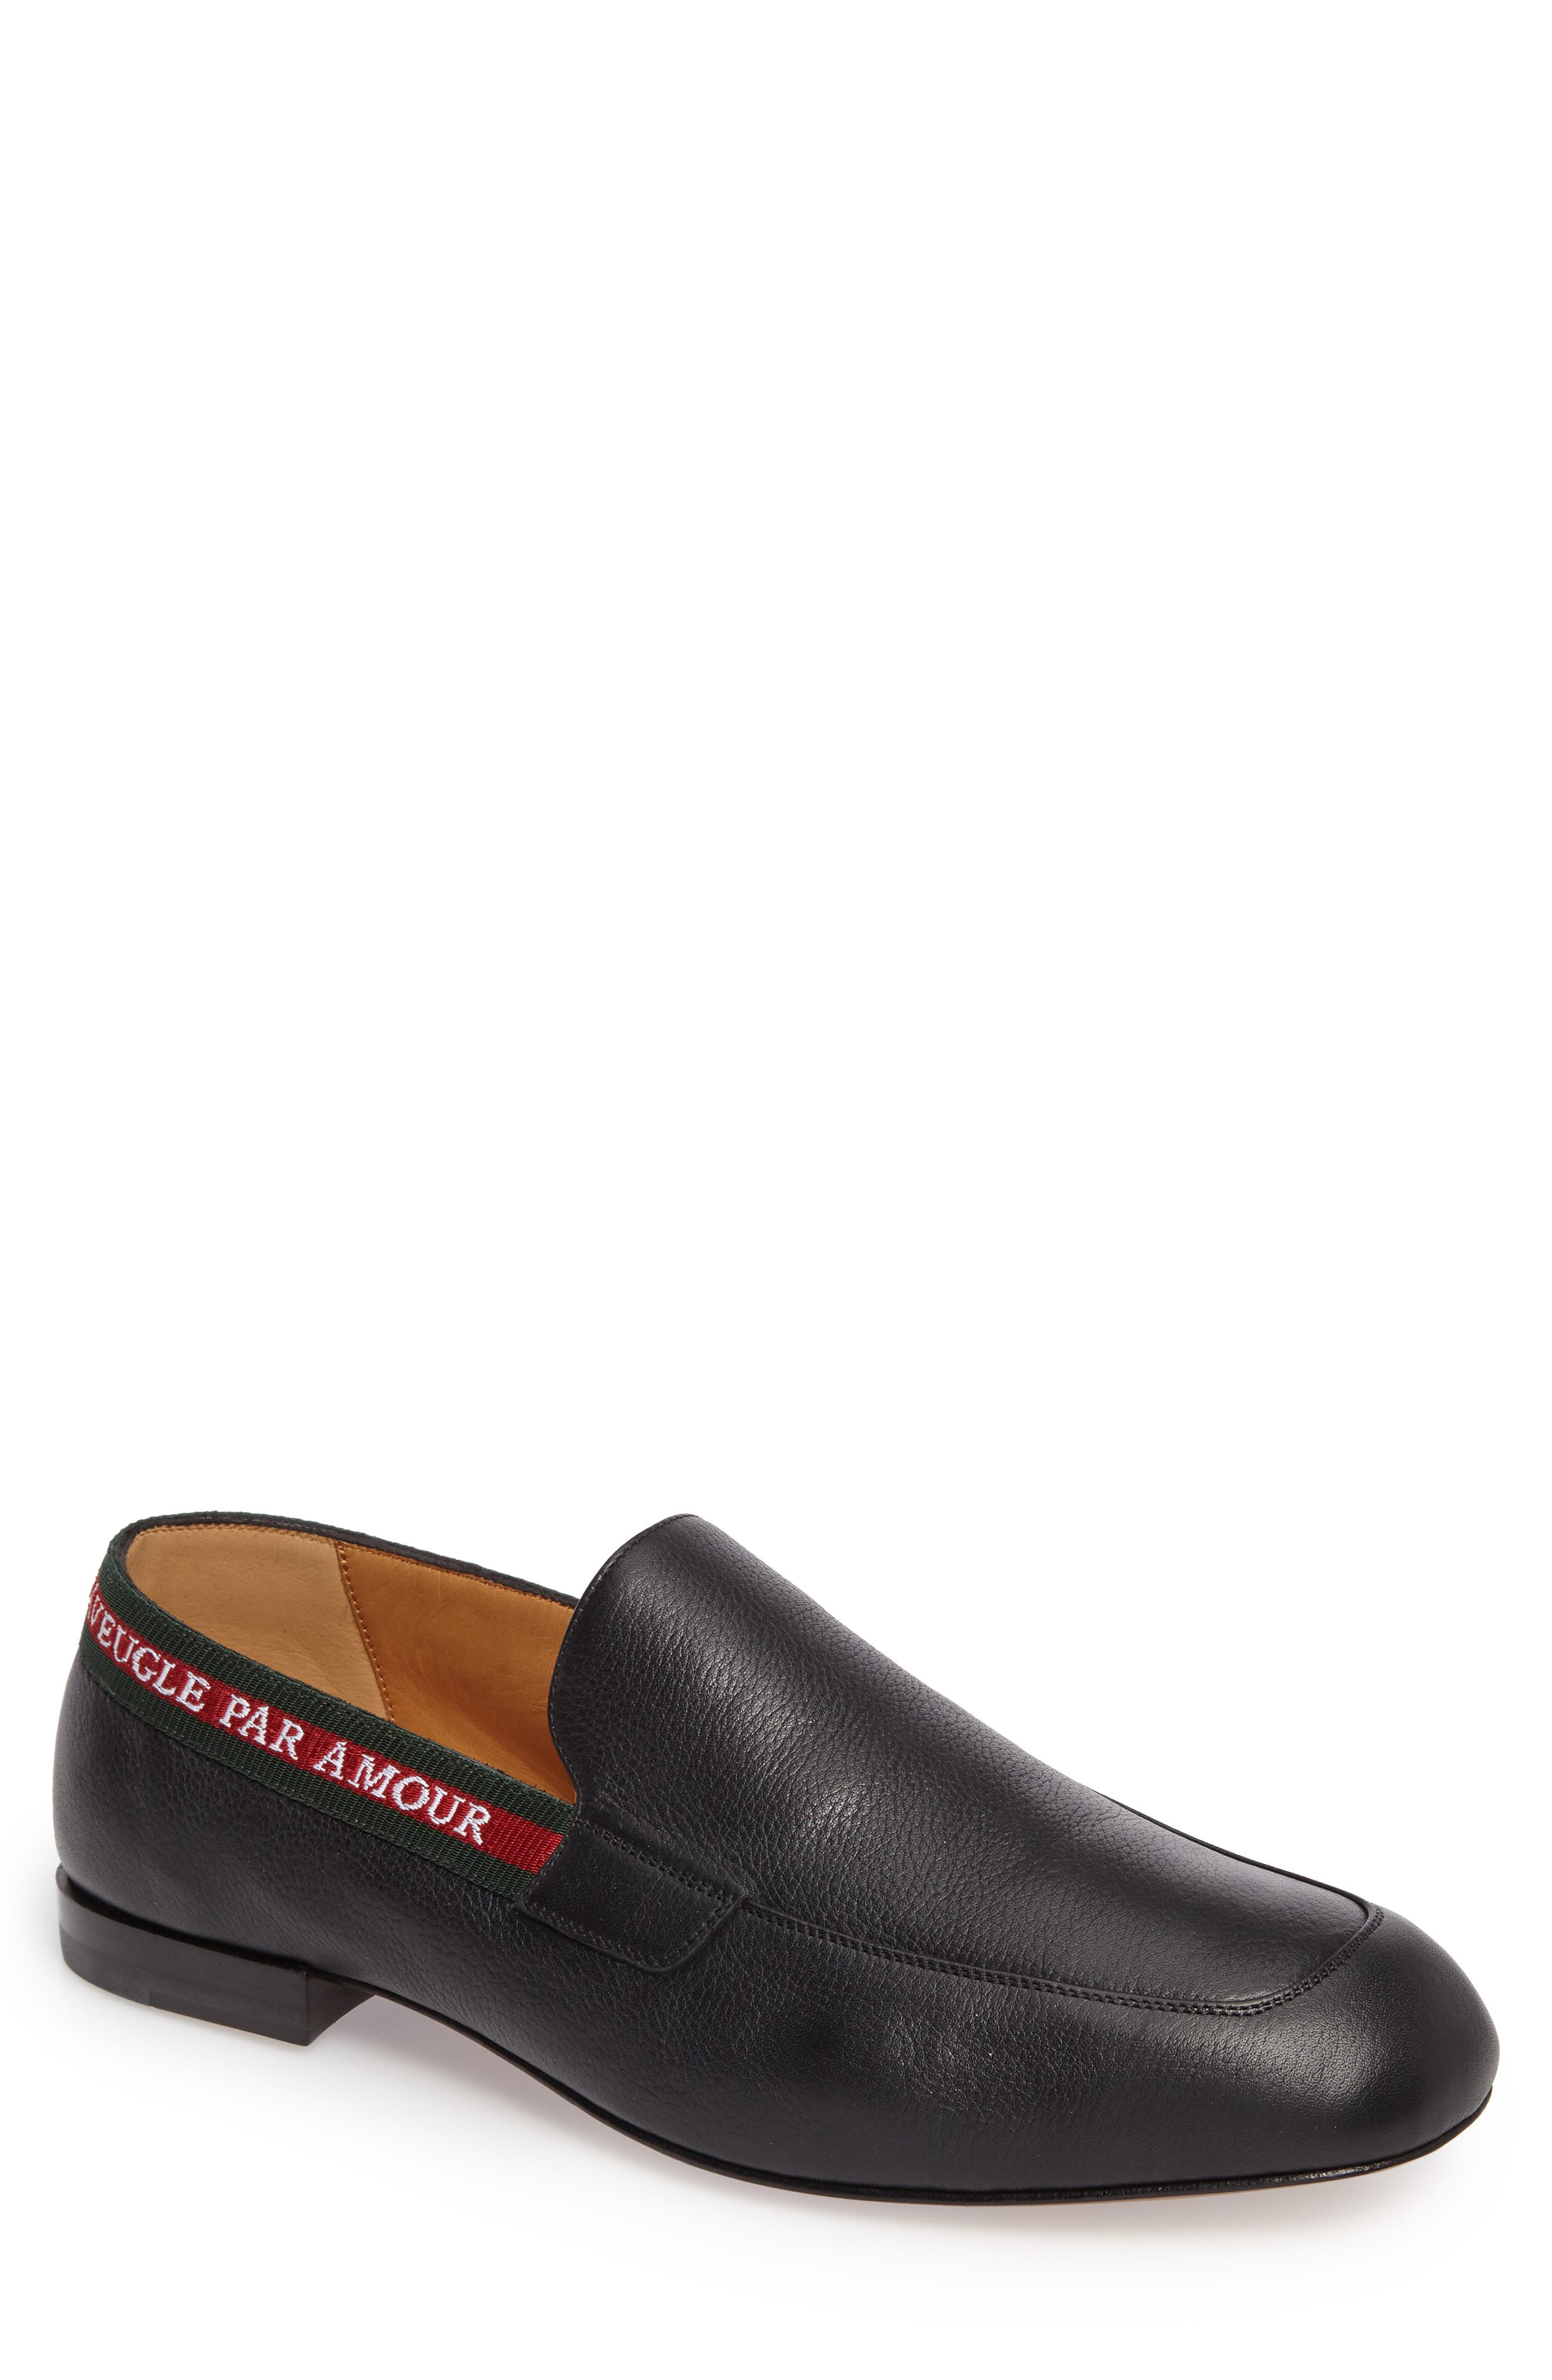 Alternate Image 1 Selected - Gucci Vicente L'Avenue Loafer (Men)